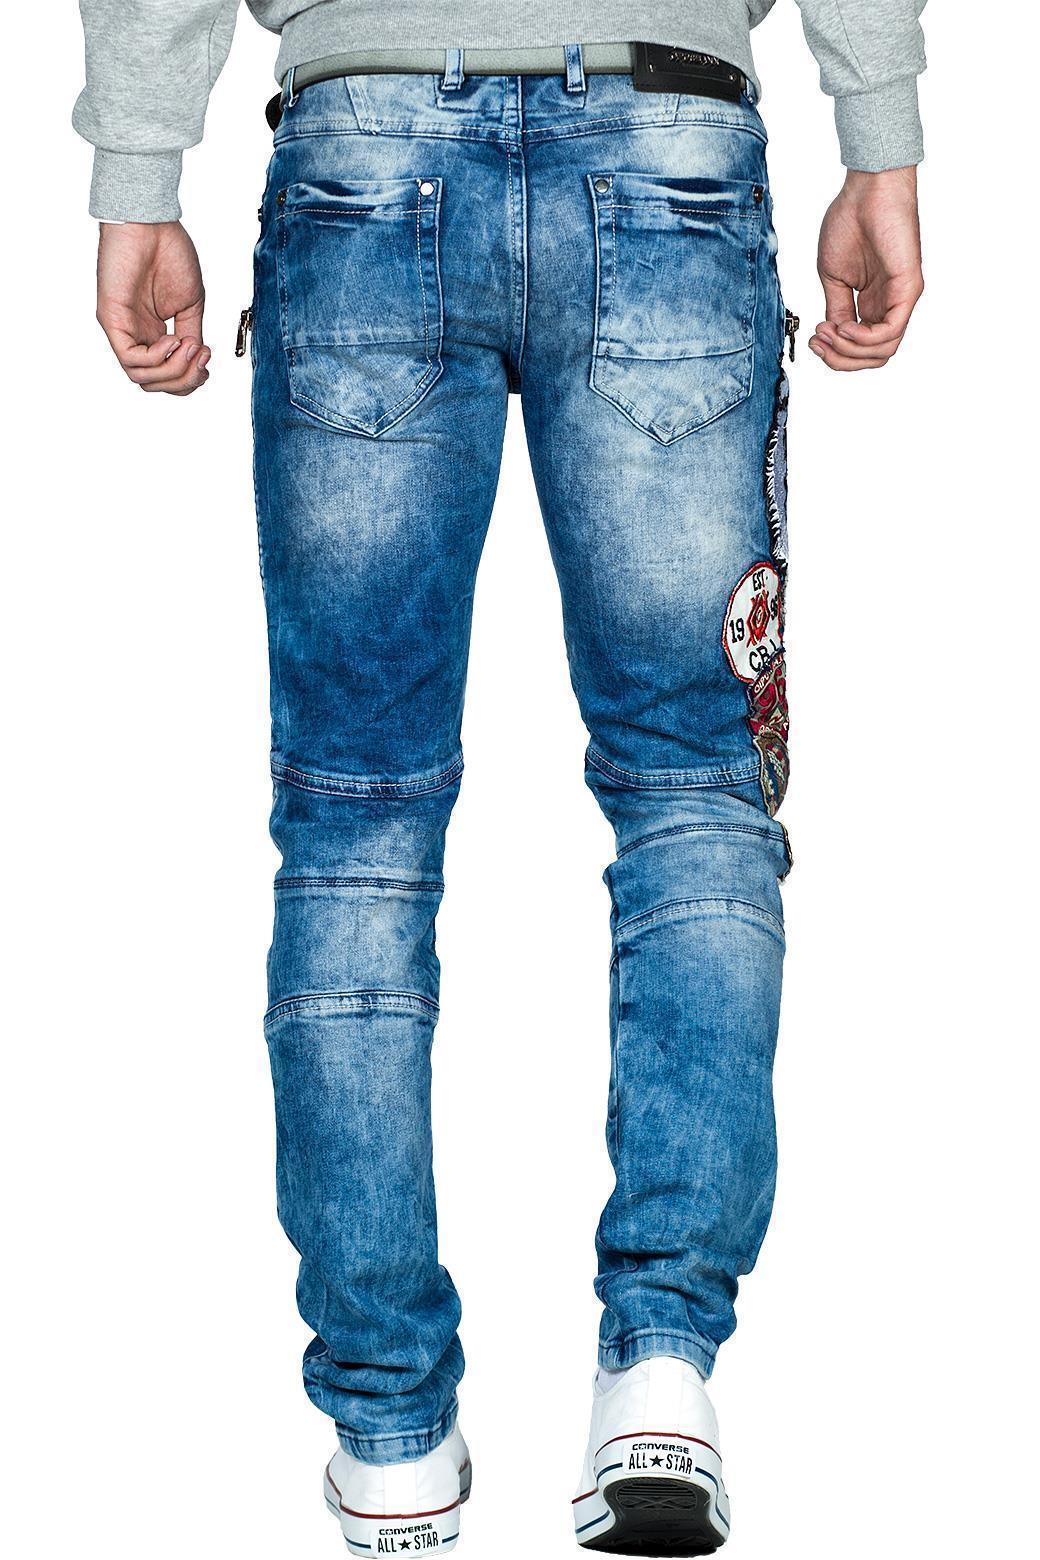 Cipo-amp-Baxx-Uomo-Jeans-Pantaloni-ricamate-Biker-Style-streetwear-nervature-pattern-Dope miniatura 35